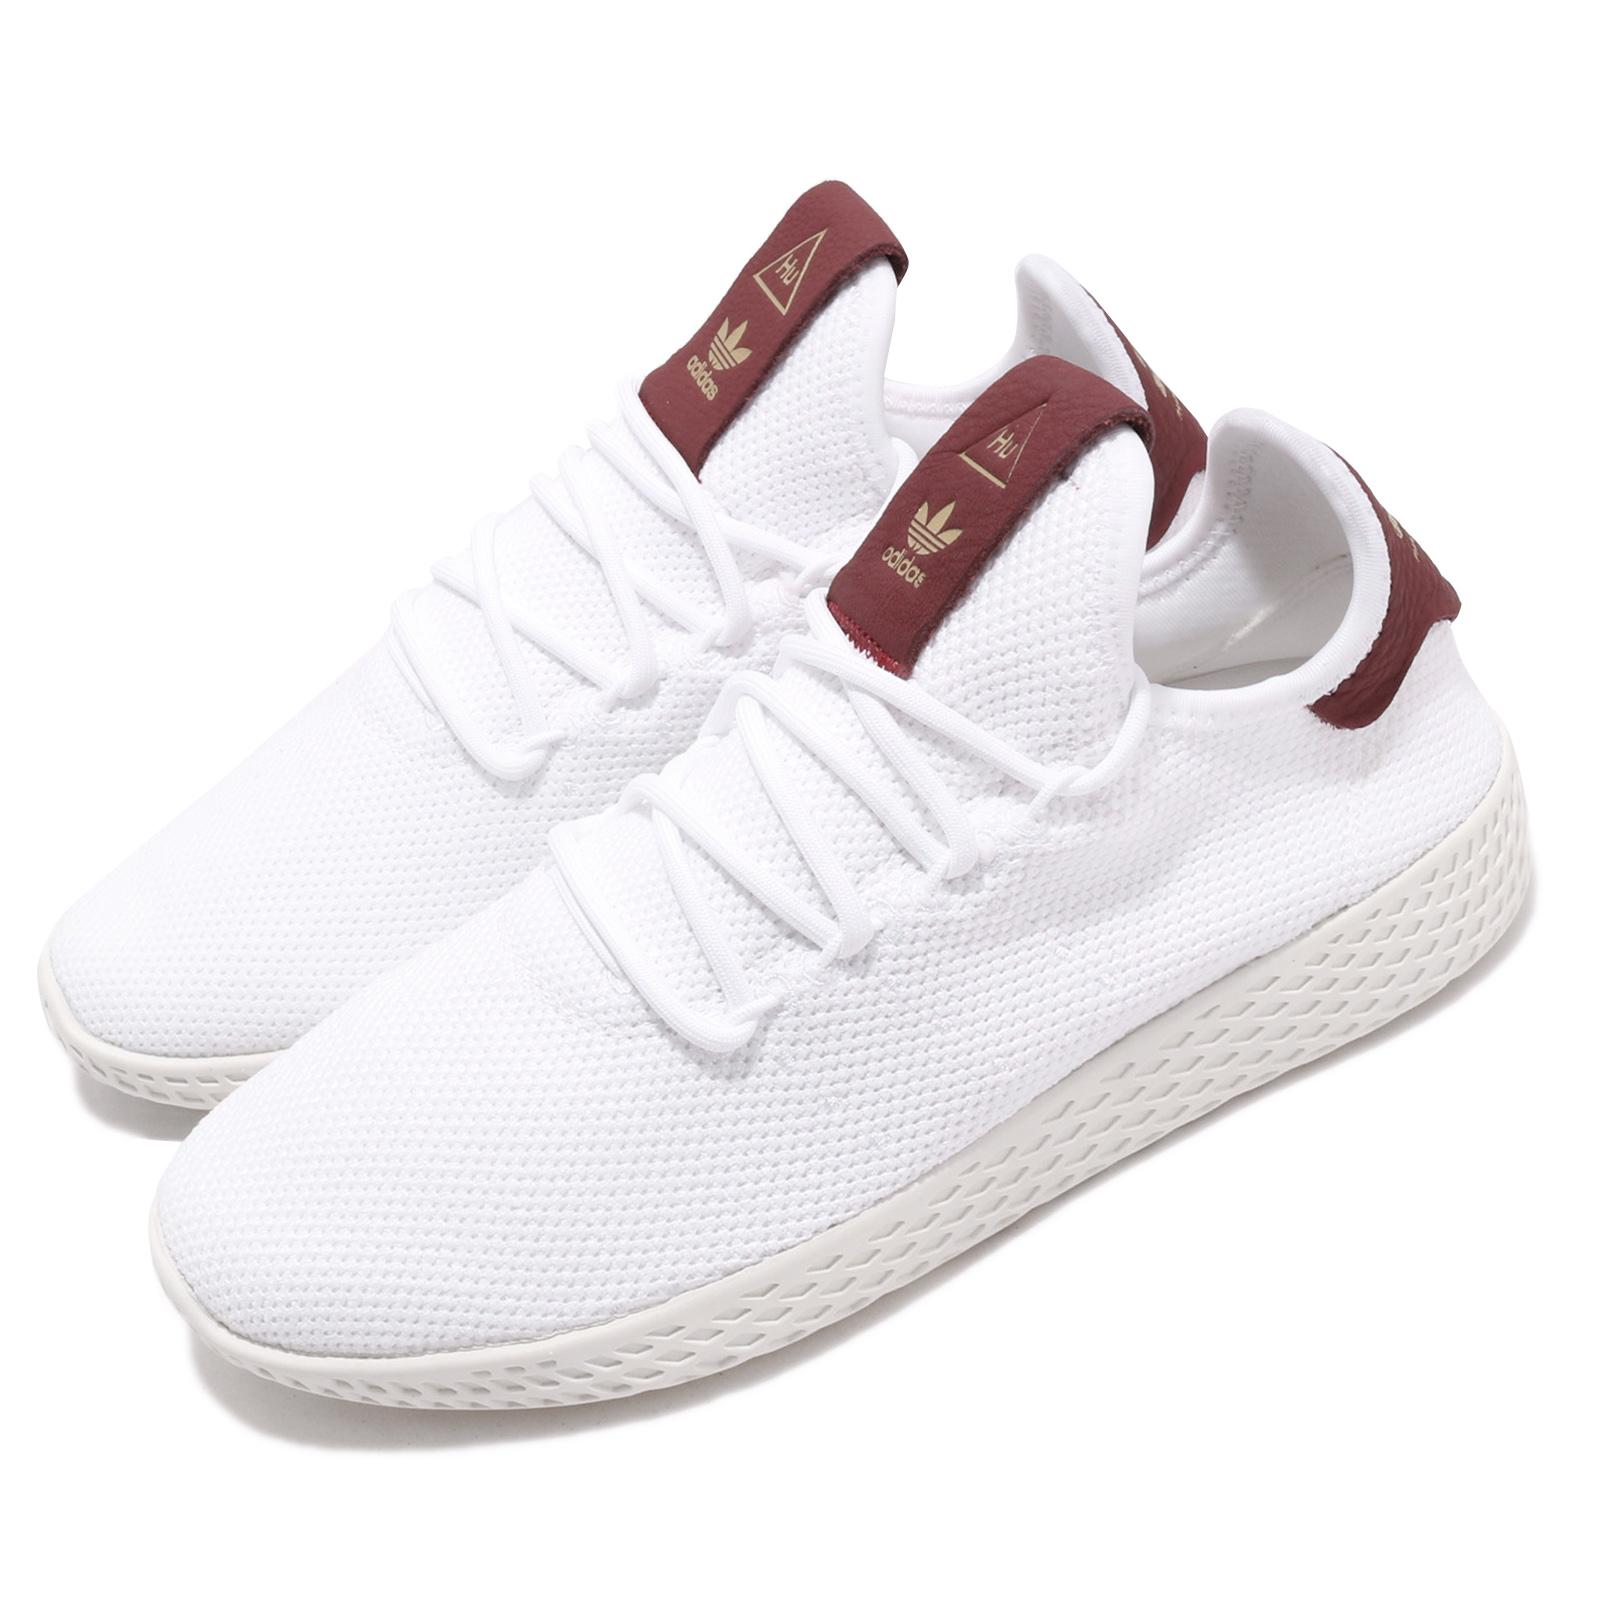 ADIDAS ORIGINALS PW TENNIS HU W Sneakers For Women